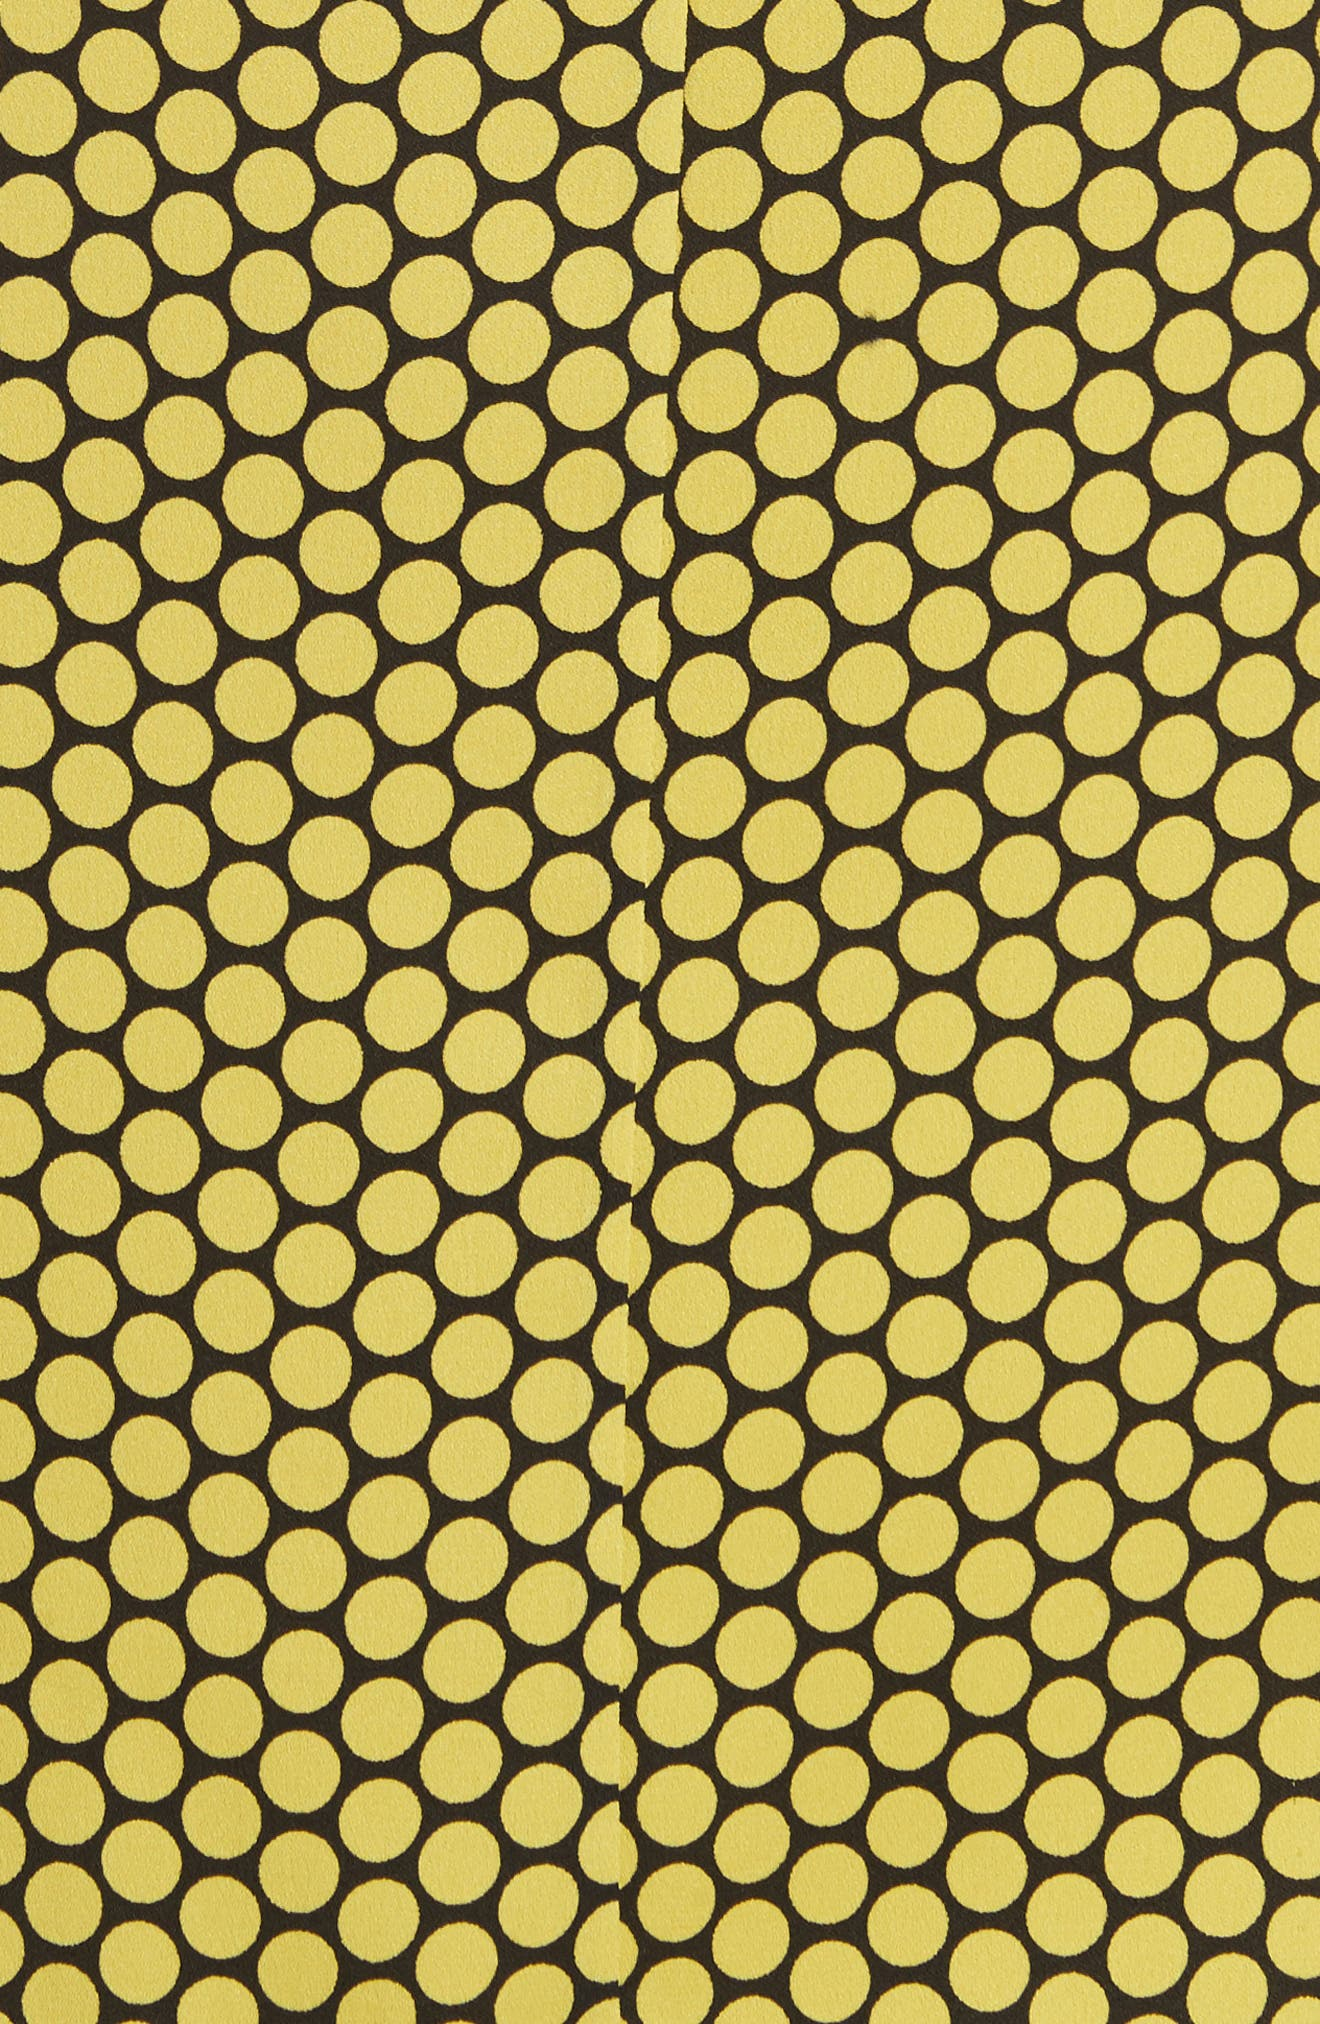 Diane von Furstenberg Floral Print Silk Shell,                             Alternate thumbnail 5, color,                             WORSLEY CITRON/ ROWE DOT